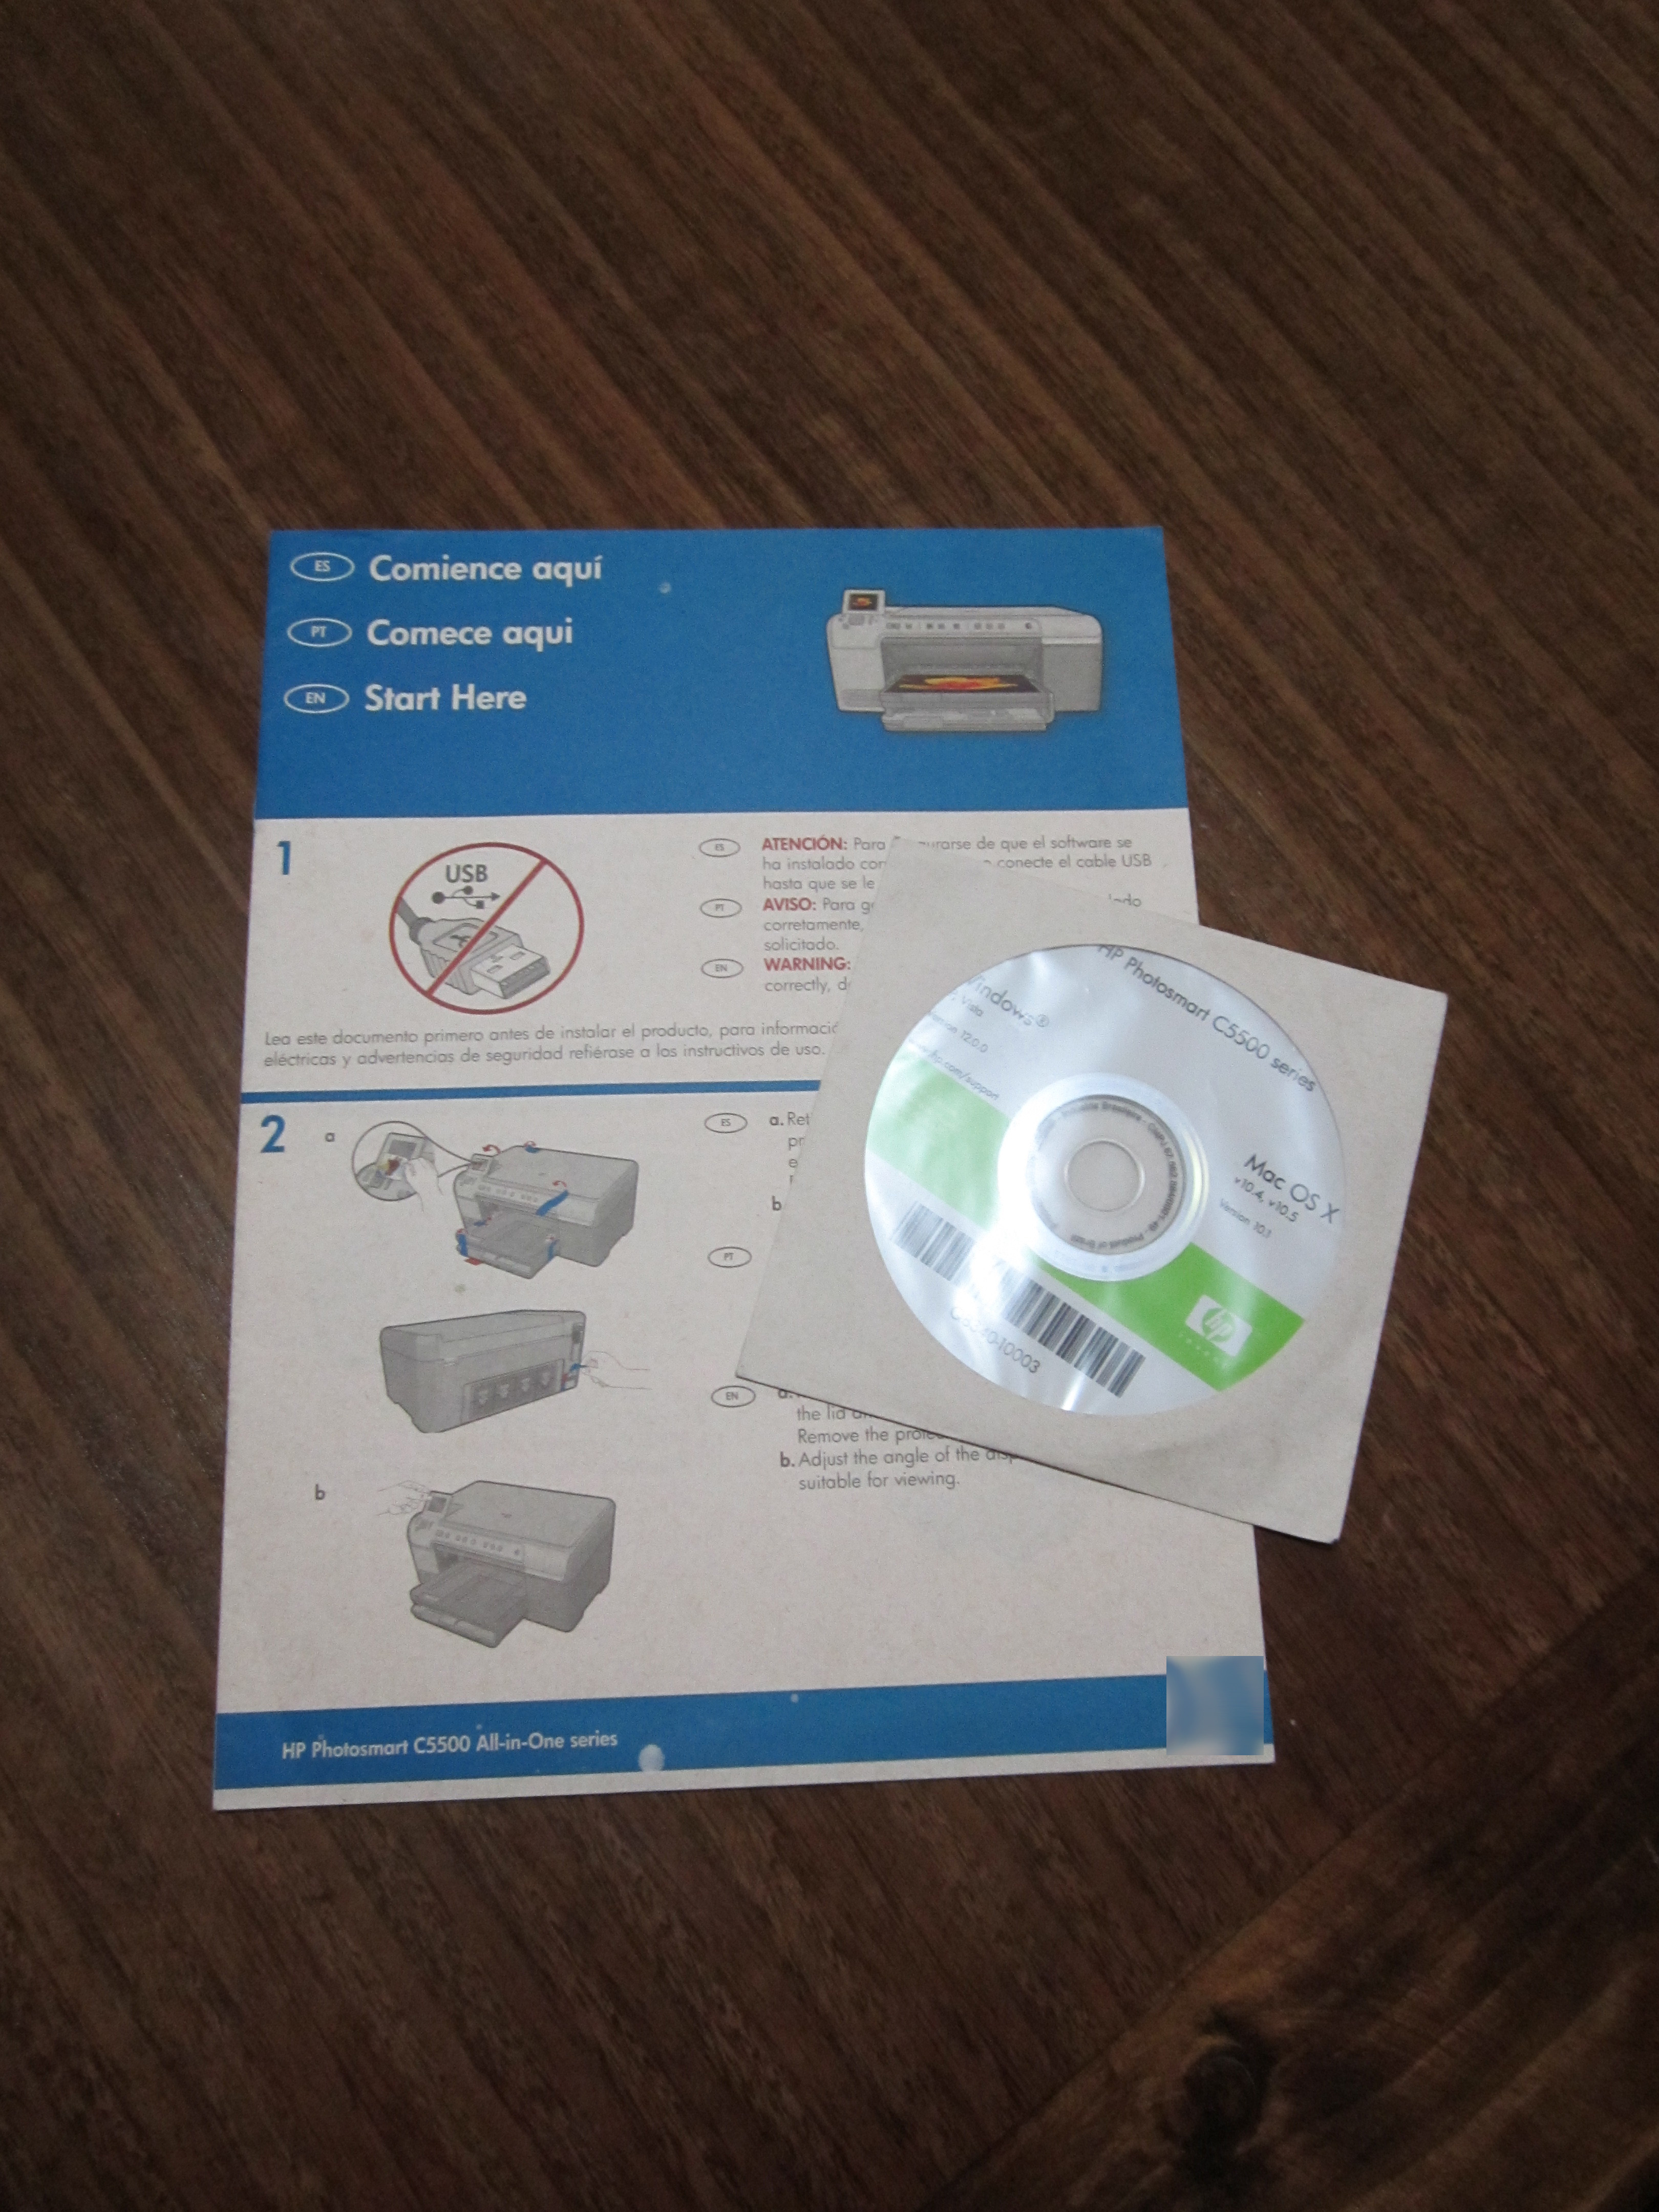 File:HP Photosmart C5500 (manual).jpg